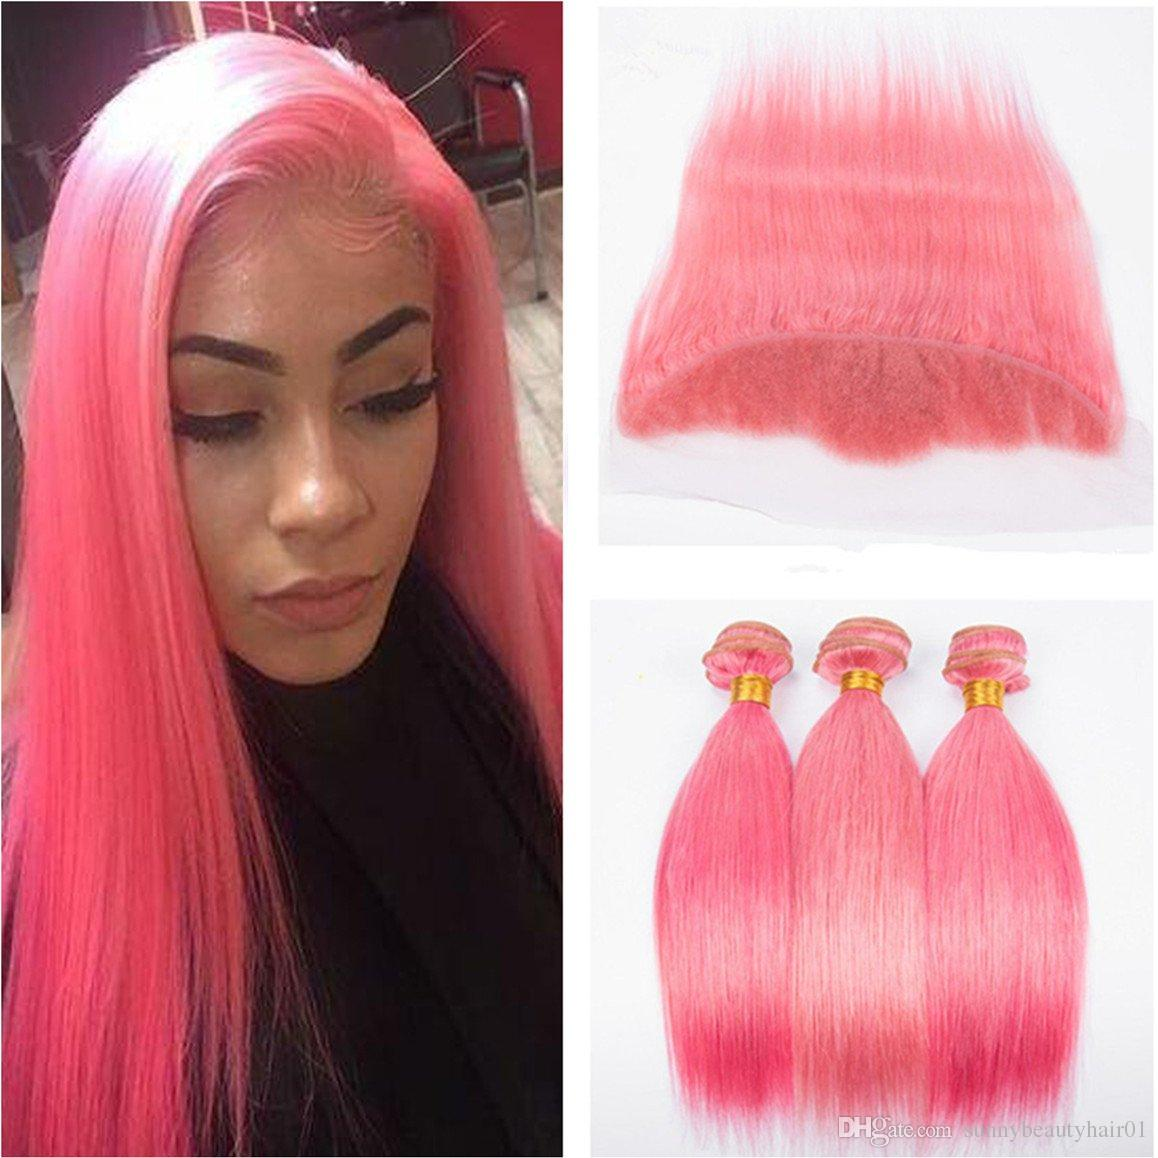 8A # 핑크 색상 인간의 머리카락 스트레이트 번들 우대에 귀에 3PCS 레이스 정면 4PCS Lot 실키 스트레이트 13x4 전체 레이스 정면 폐쇄